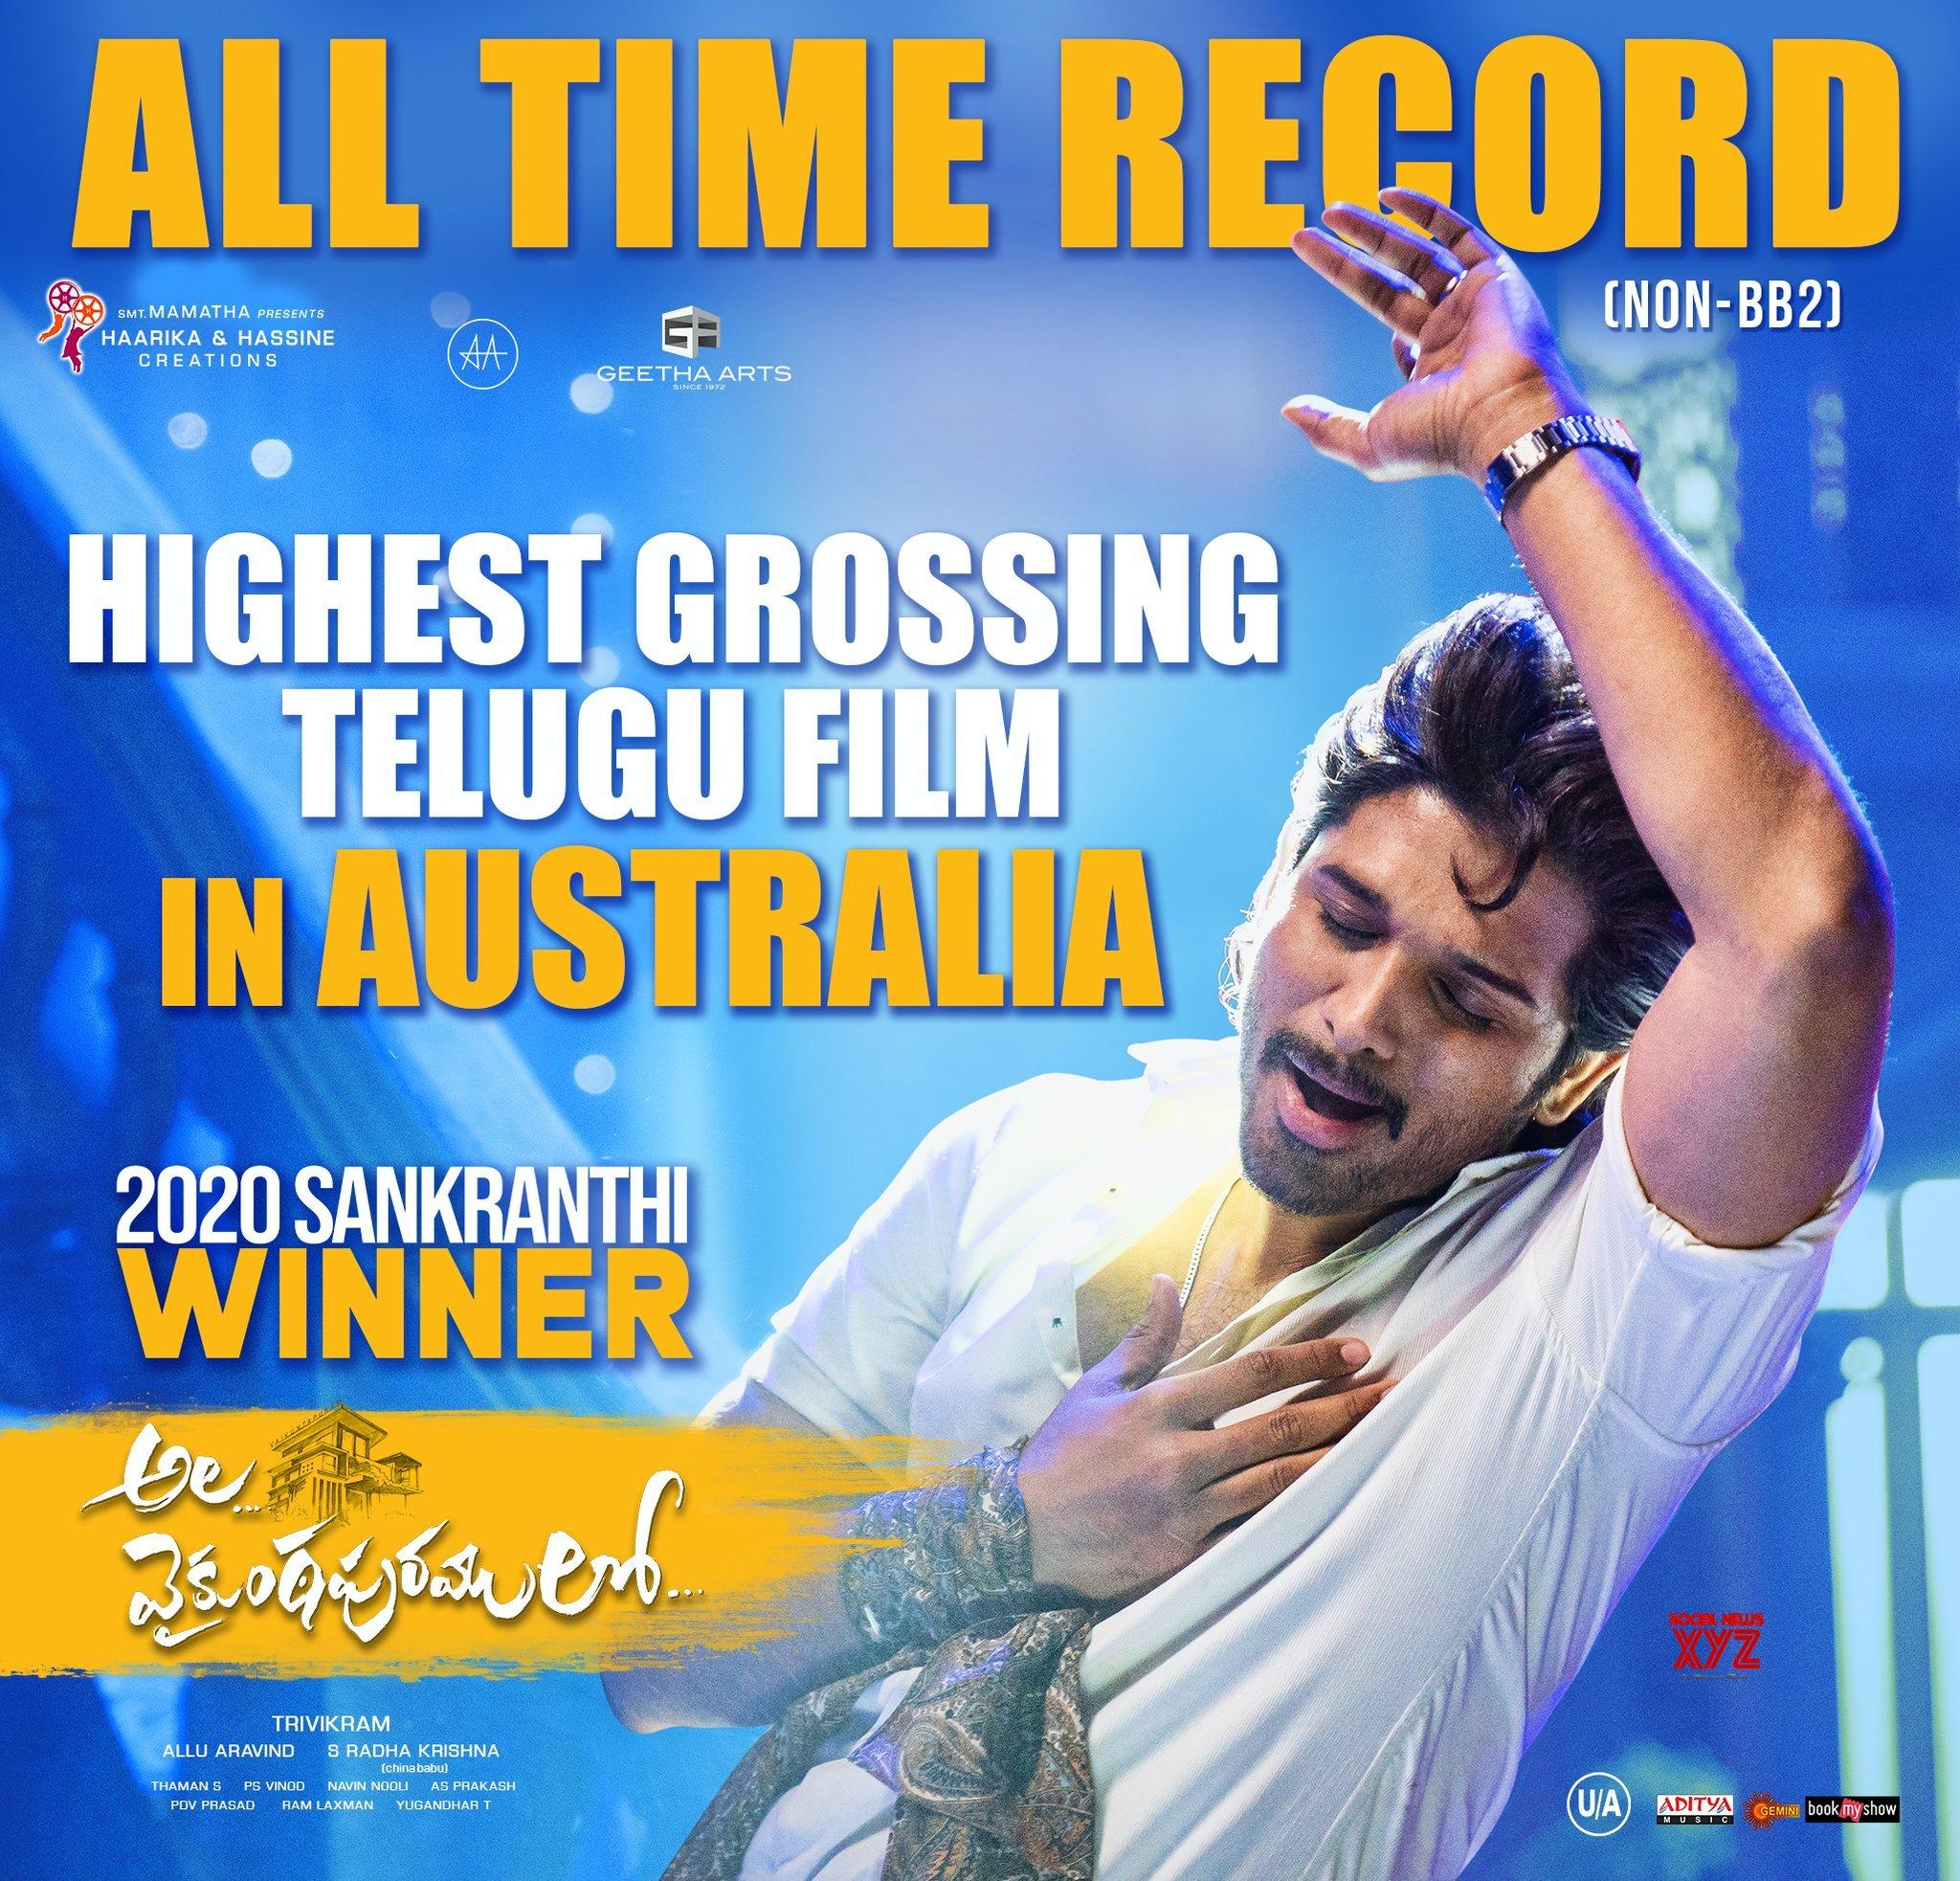 Allu Arjun S Ala Vaikunthapurramuloo Is Now The Highest Grossing Non Bb2 Telugu Film Ever In Australia Social News Xyz